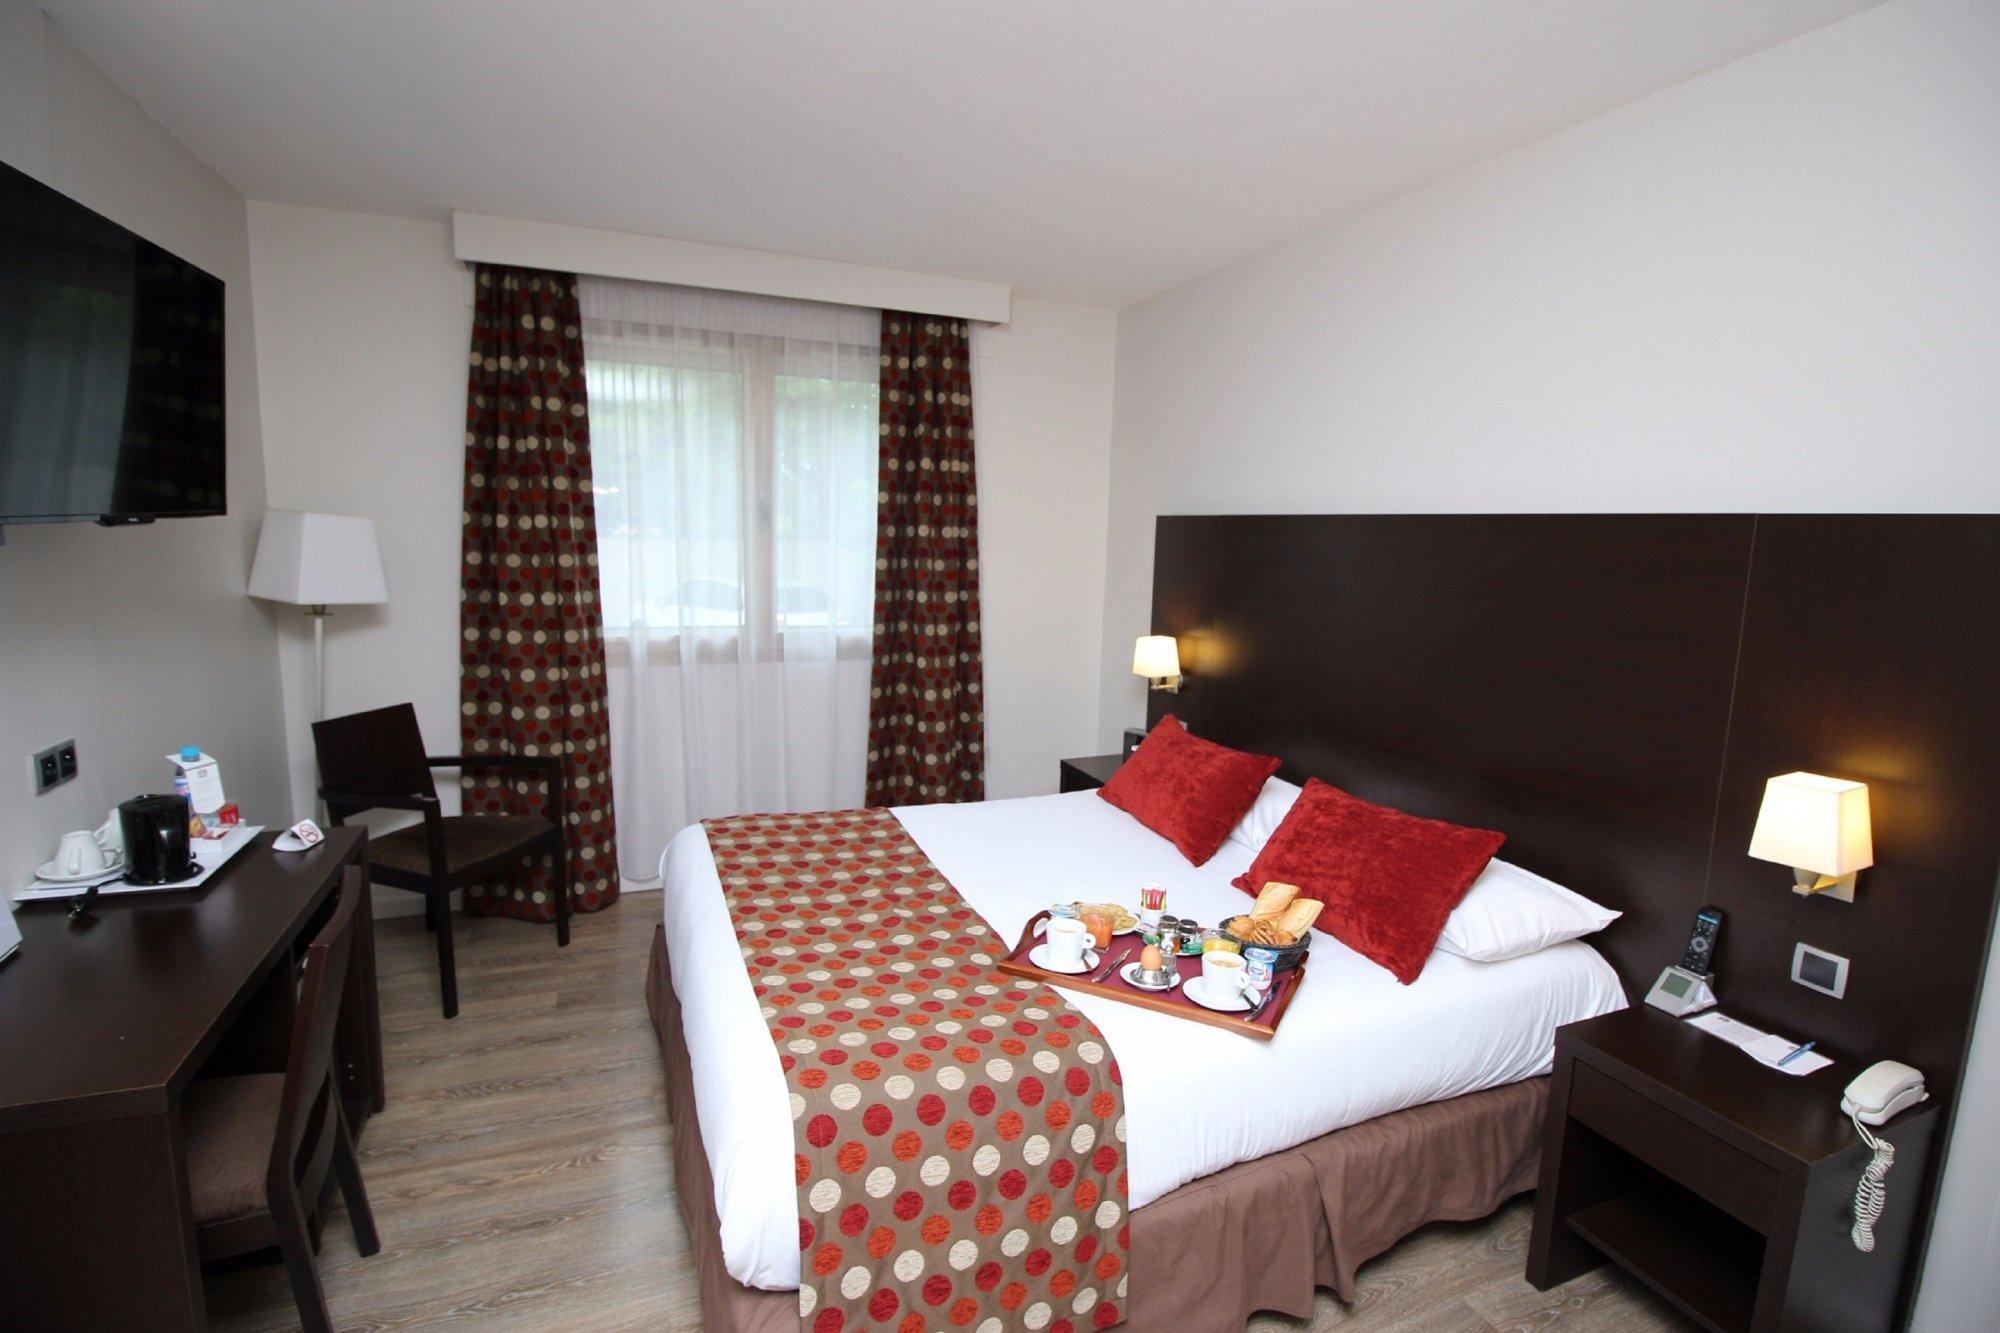 BEST WESTERN Hotel Des Barolles - Lyon Sud